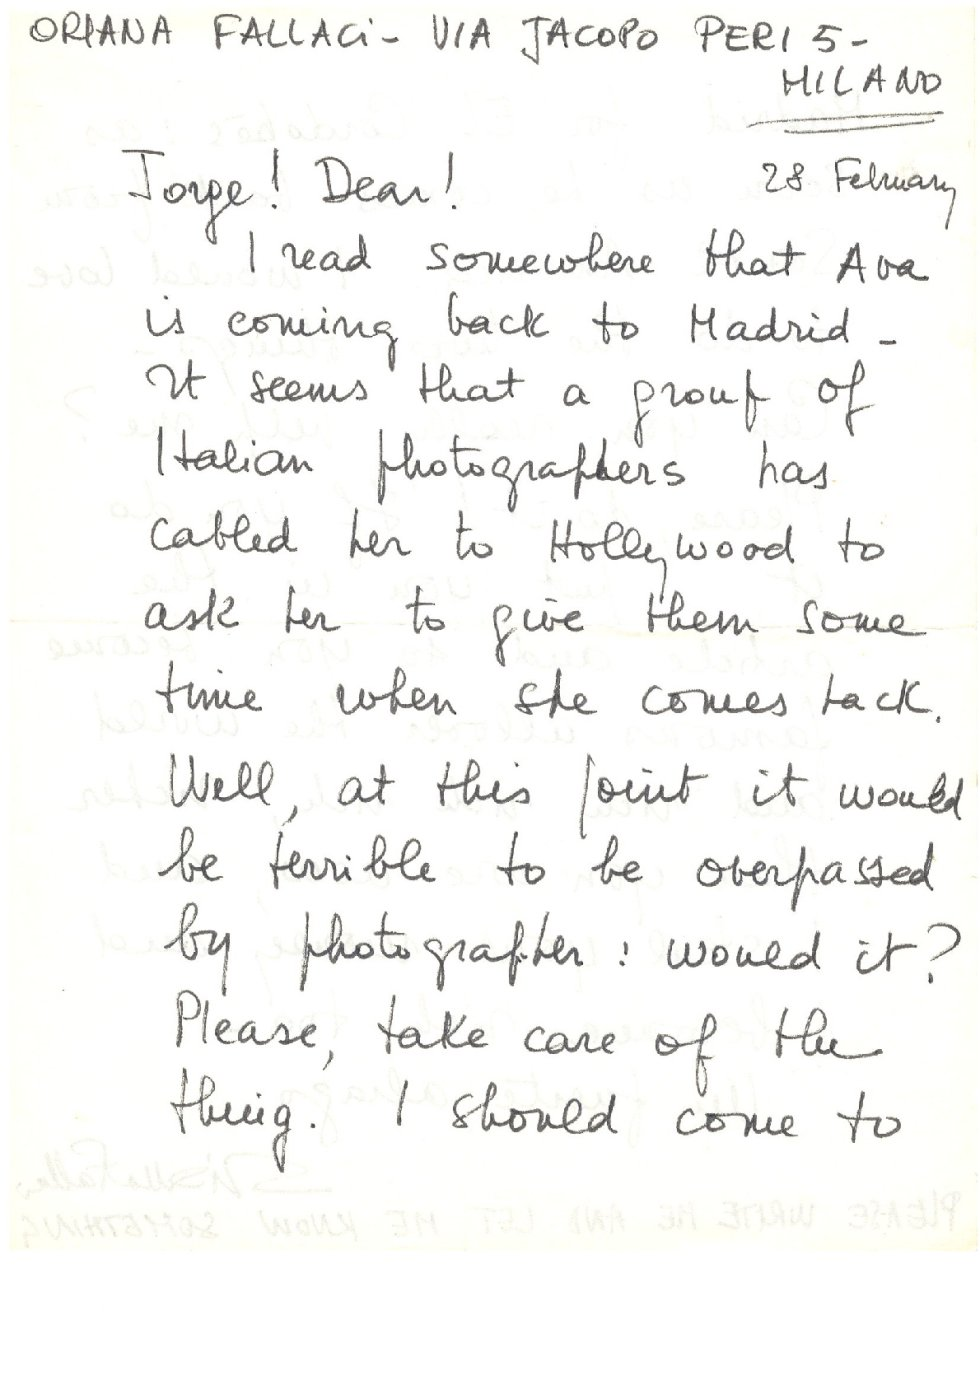 Mensaje de Oriana Fallaci sobre AVA